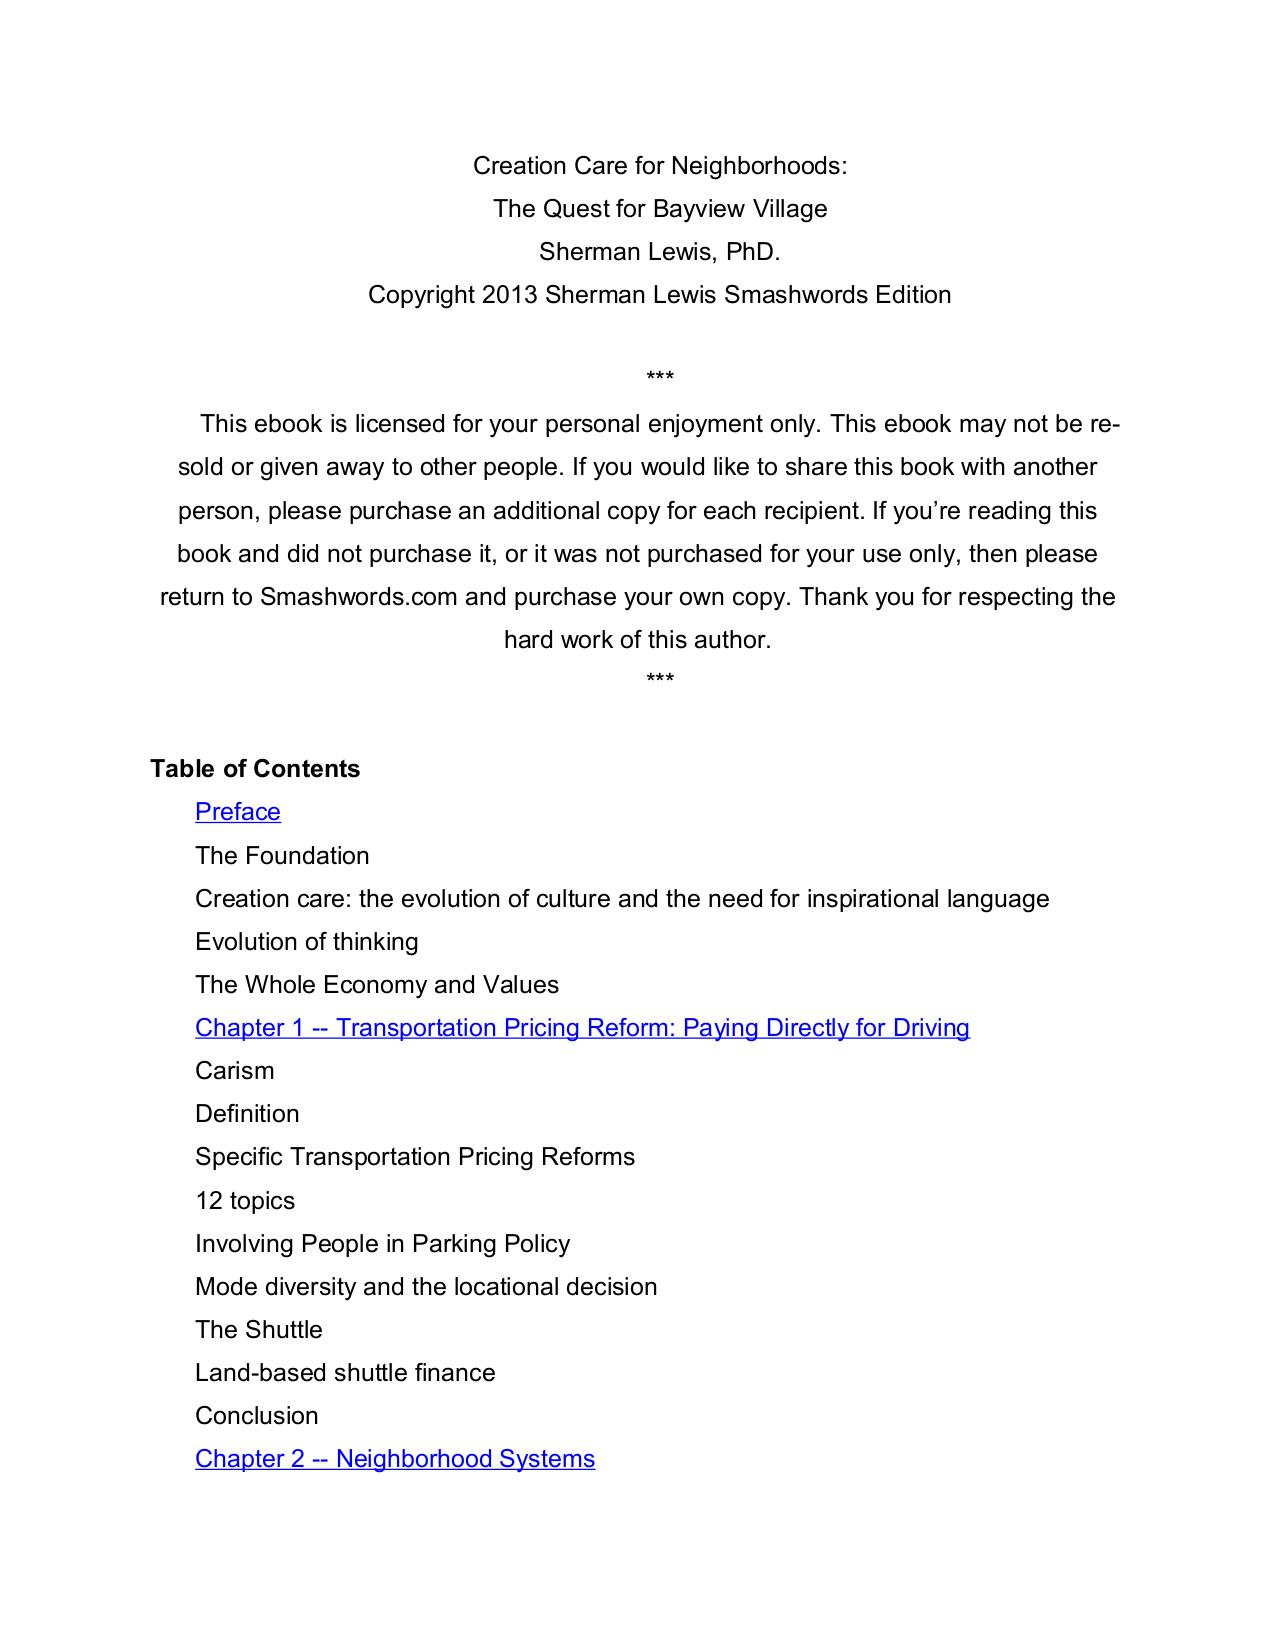 pdf for LG Vacuum LuV200 manual